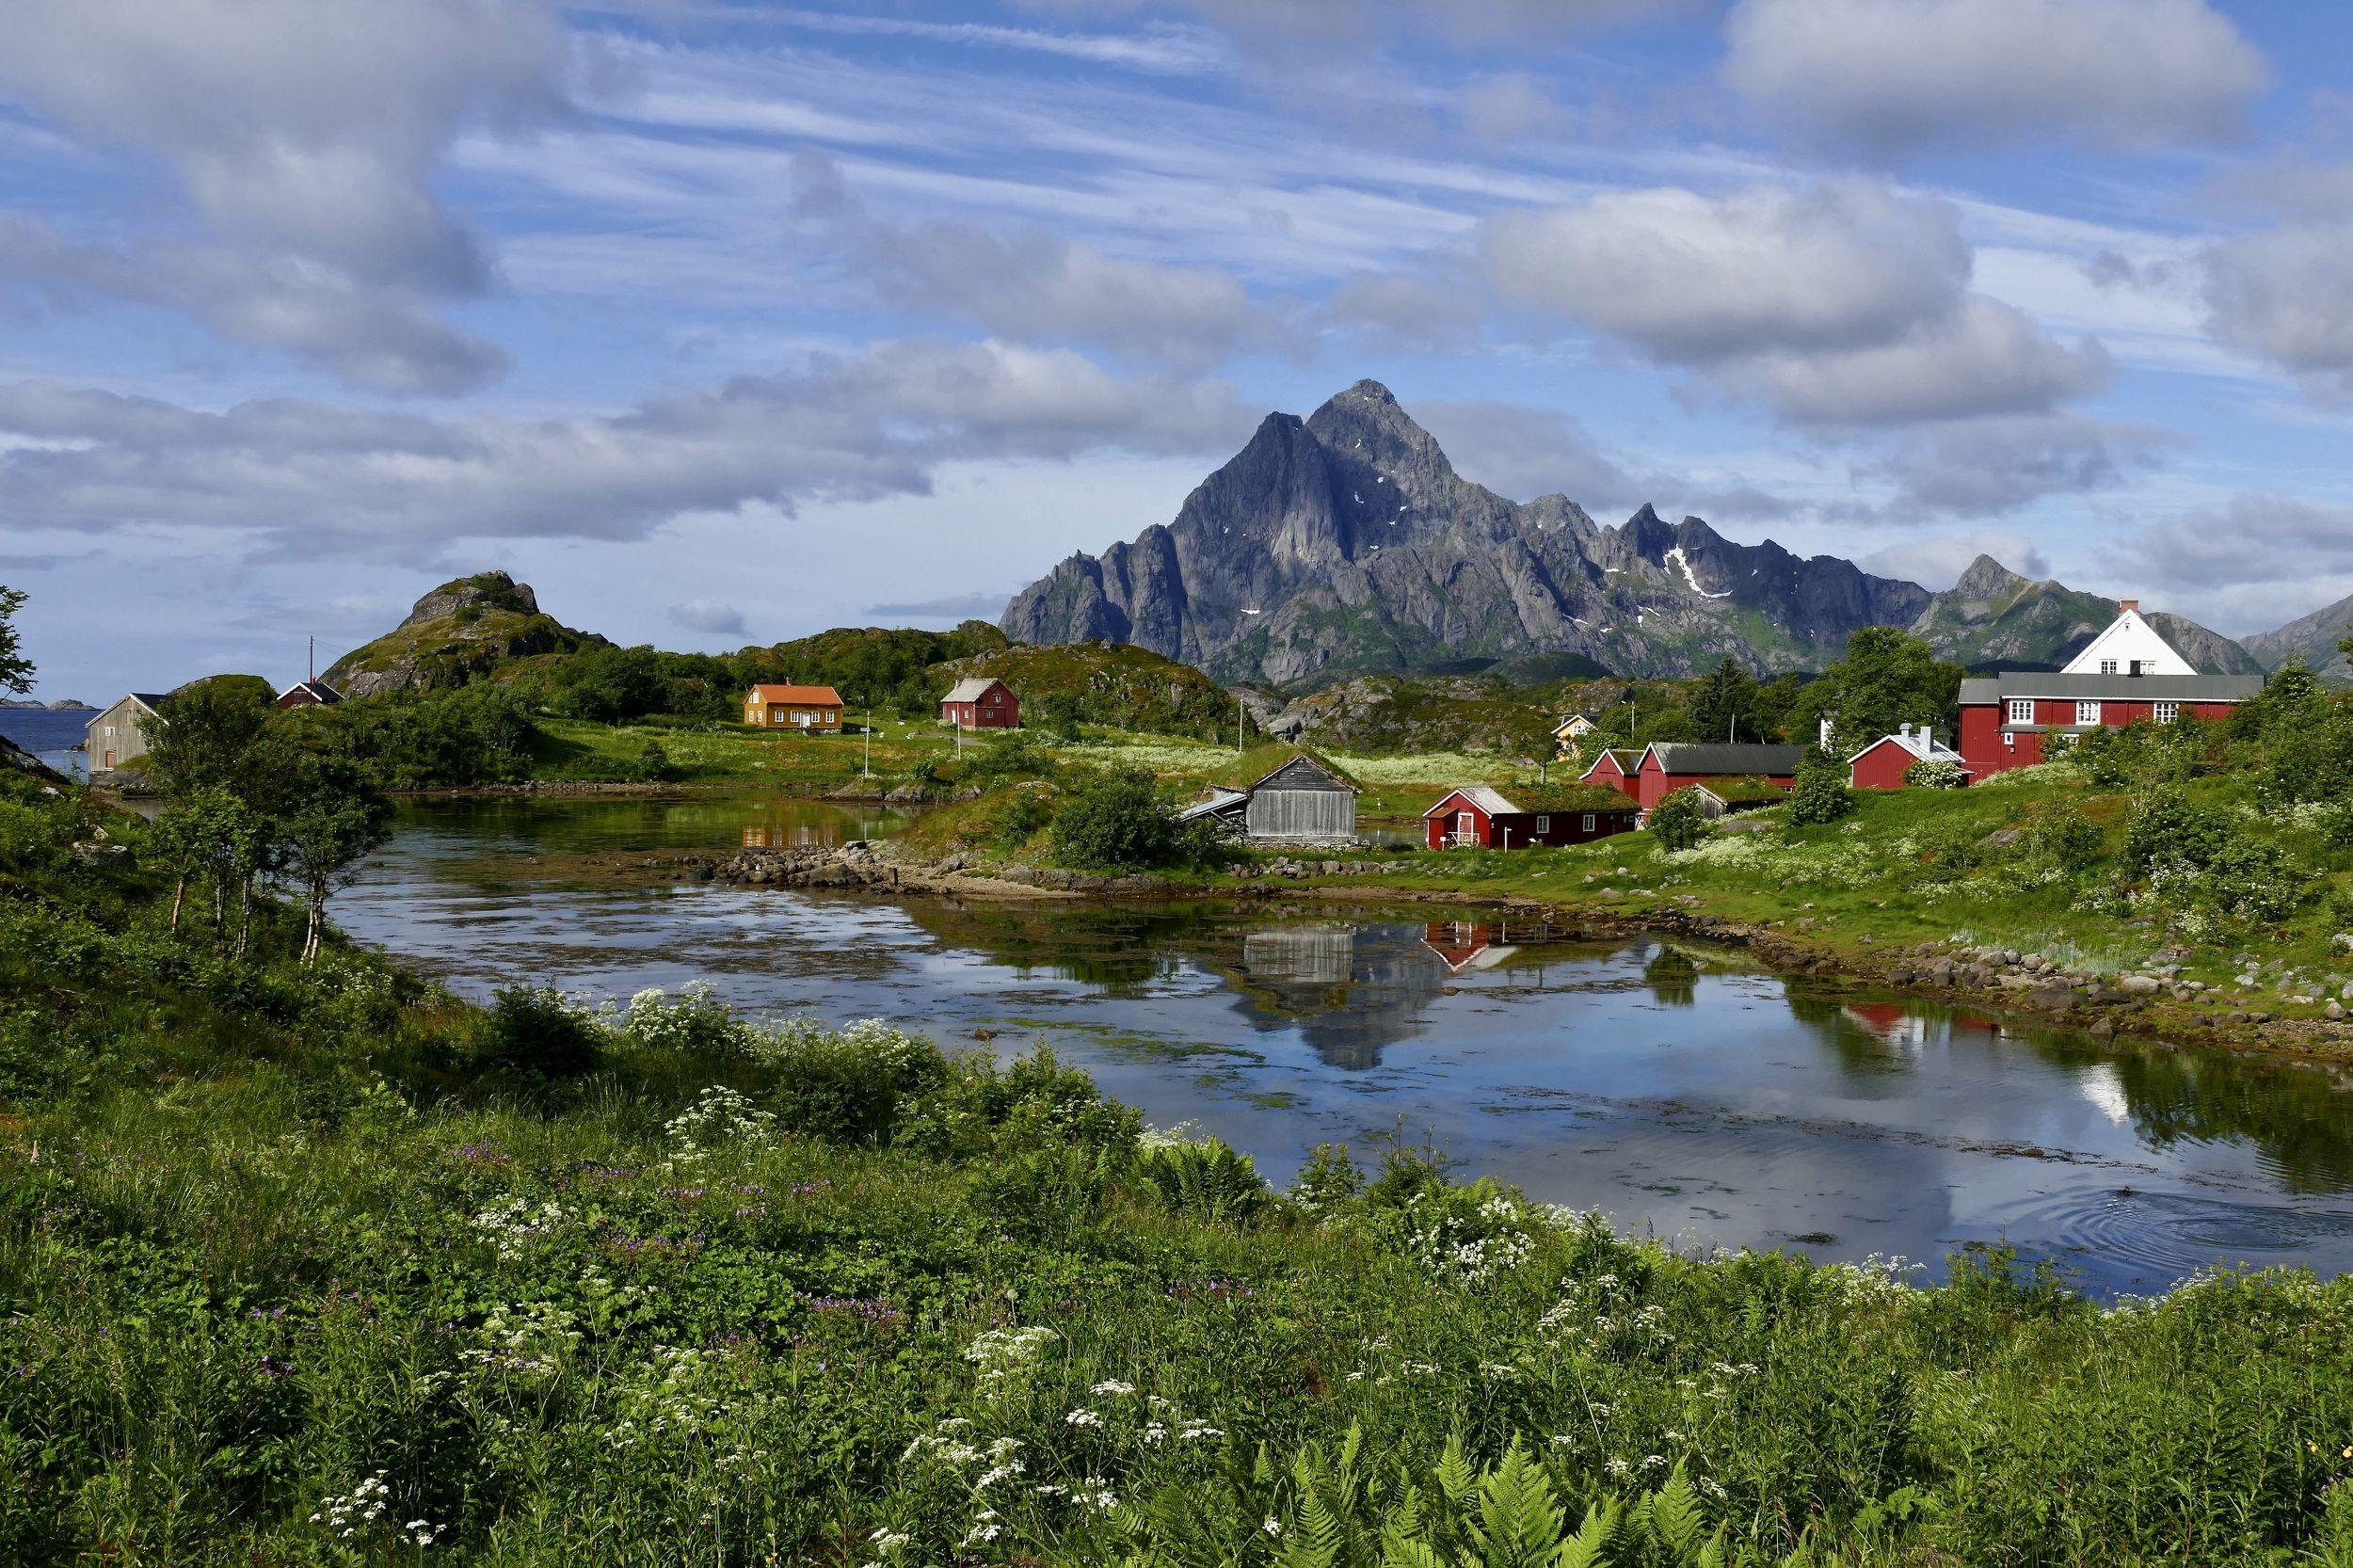 Landscapes, nature, Norway, Lofoten, mountain, water, fjord, houses, colors, reflection, travel, summer, sky, clouds, sun light, , Povarova Ree Svetlana